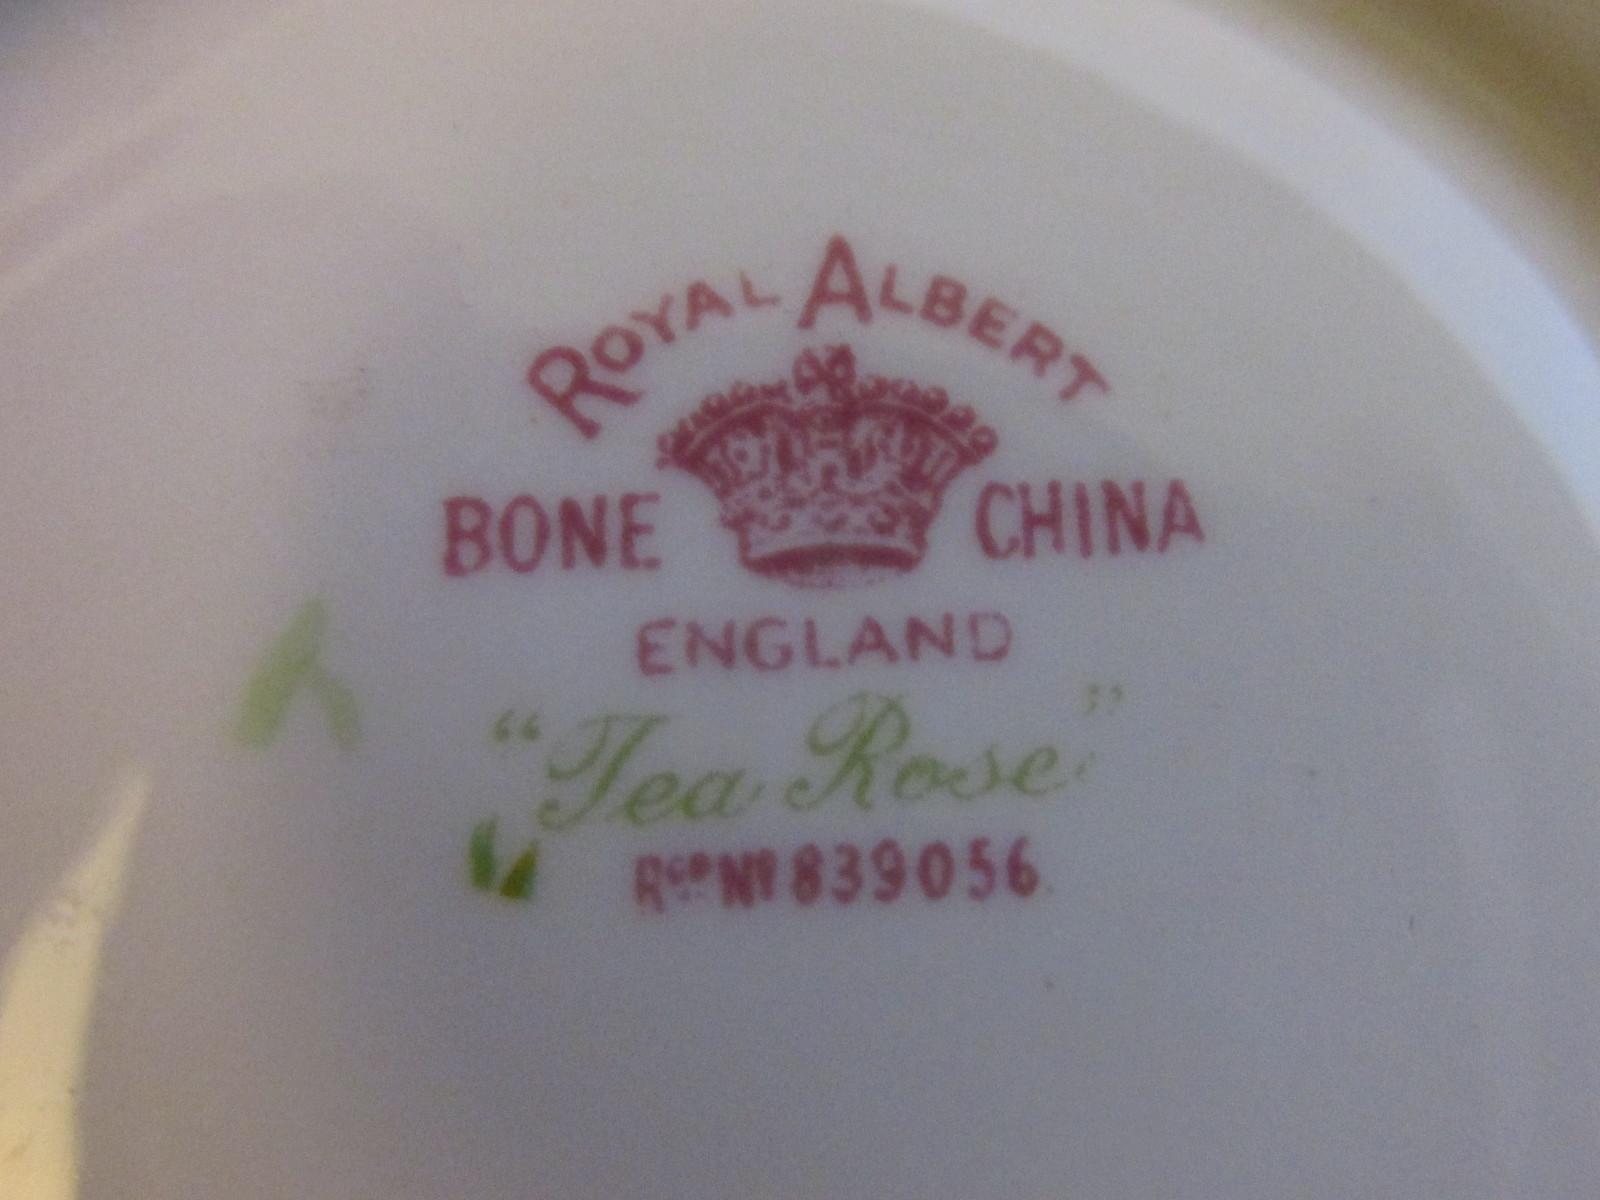 Ra tea rose5